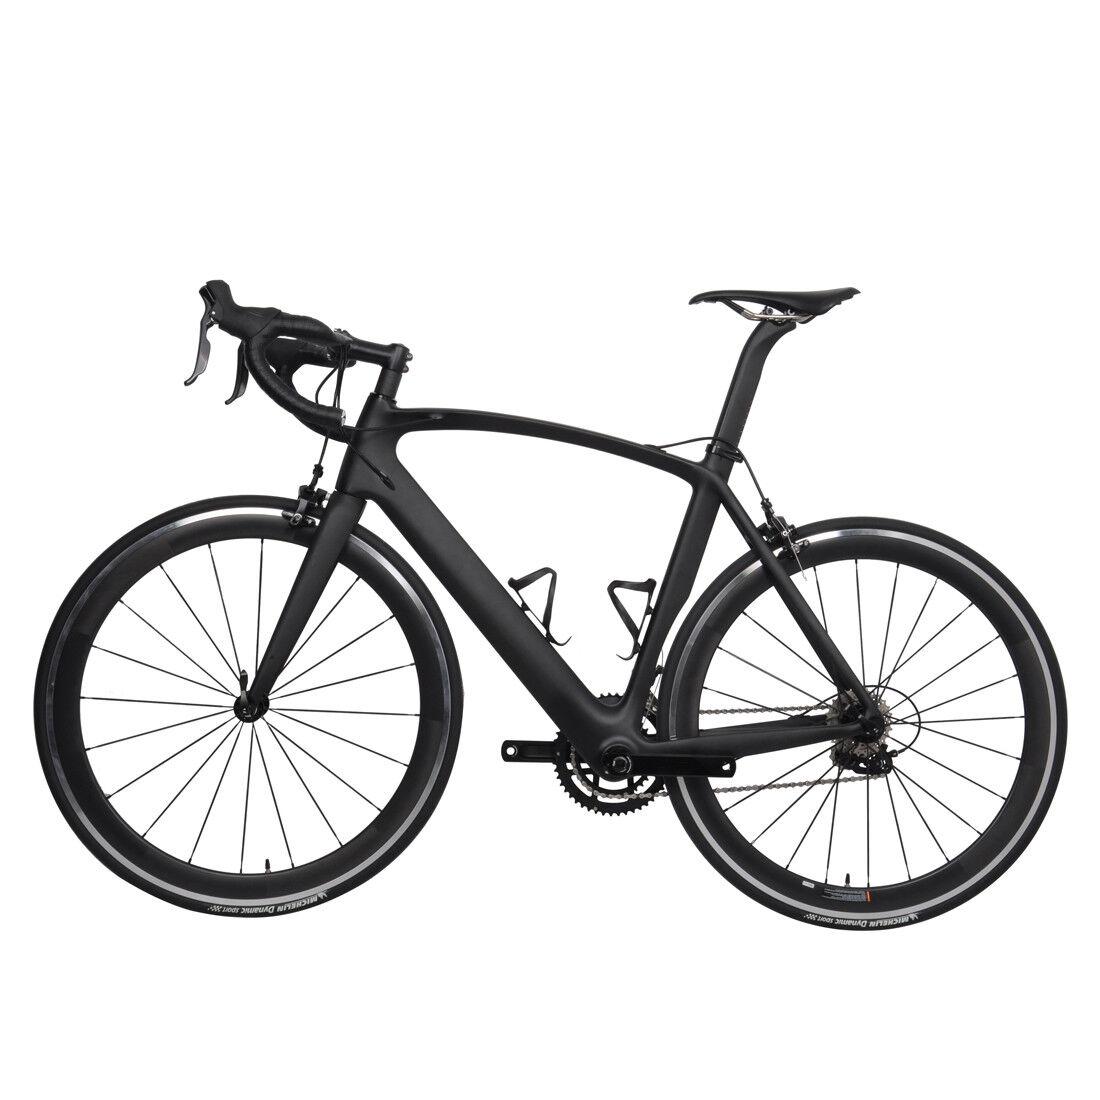 61cm AERO Carbon Bicycle Frame Road Shimano 700C Wheel Clincher seatpost V brake